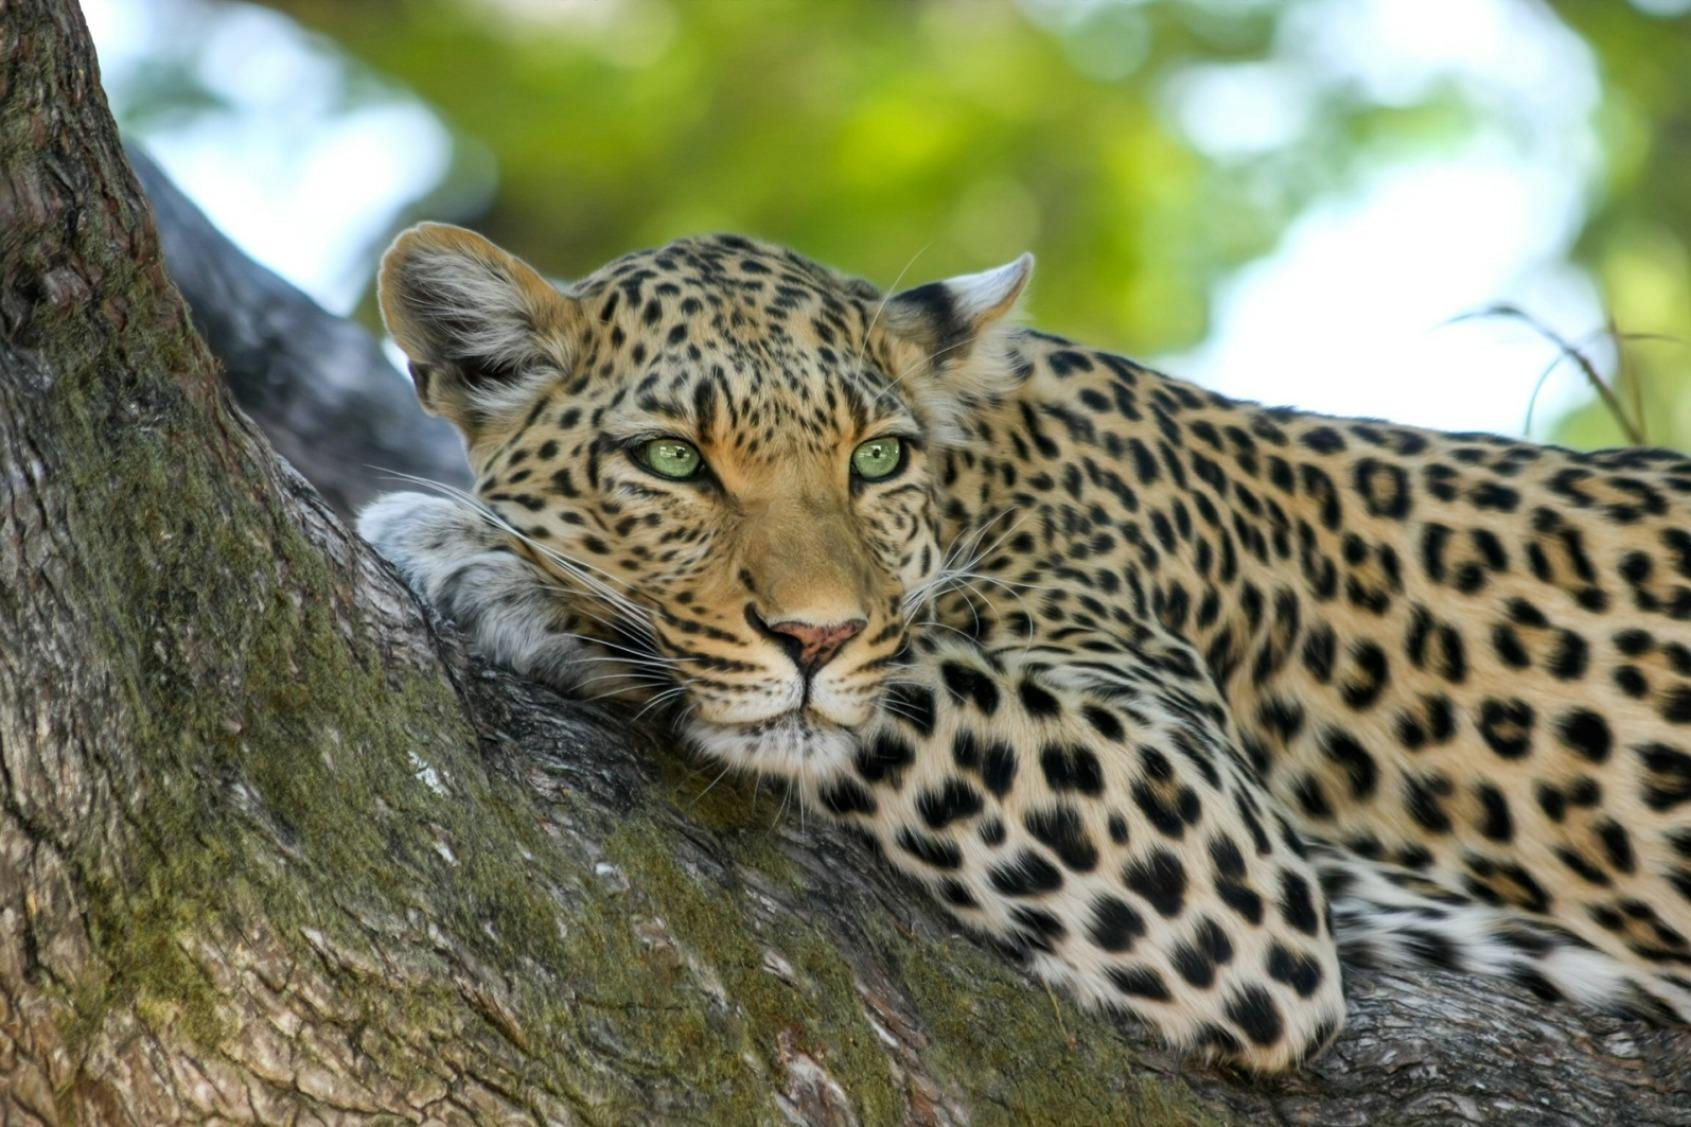 Leopard - Original image